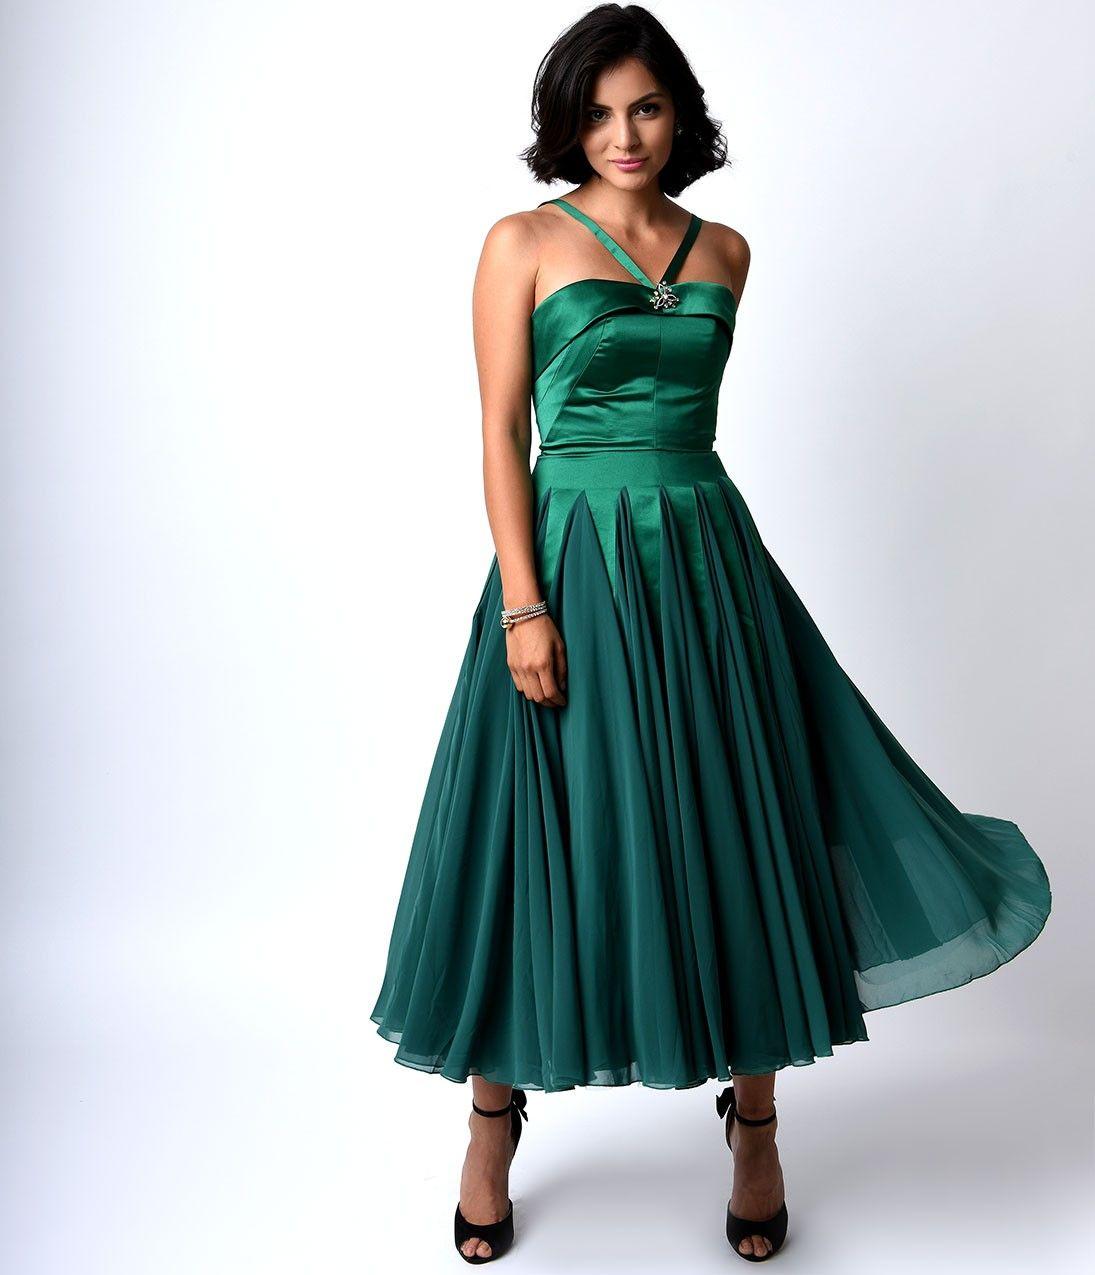 Iconic by UV Emerald Satin & Chiffon Dovima Ballerina Swing Dress ...